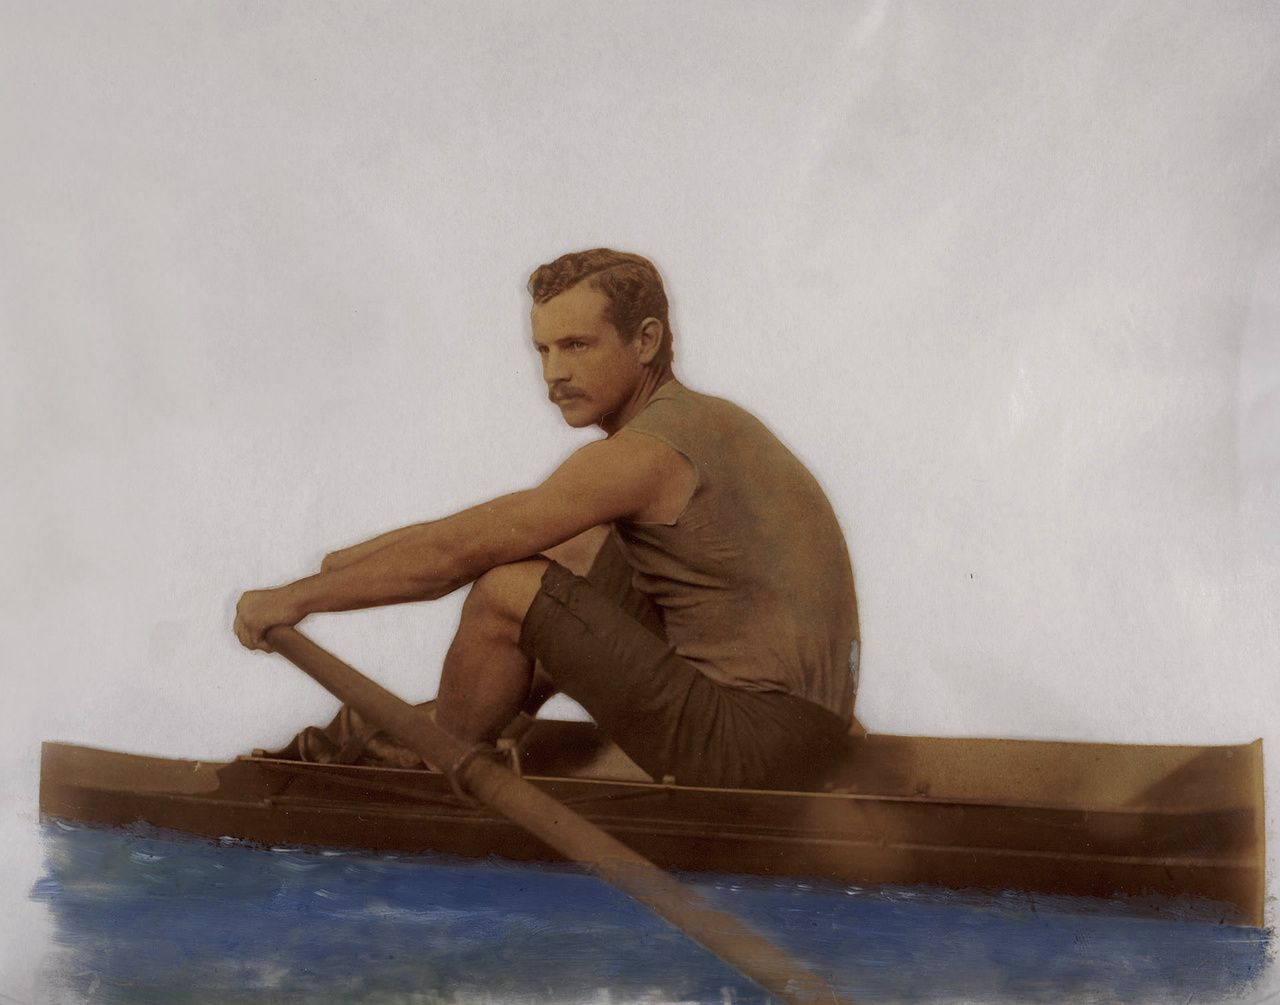 Edward Hanlan, 1855-1908